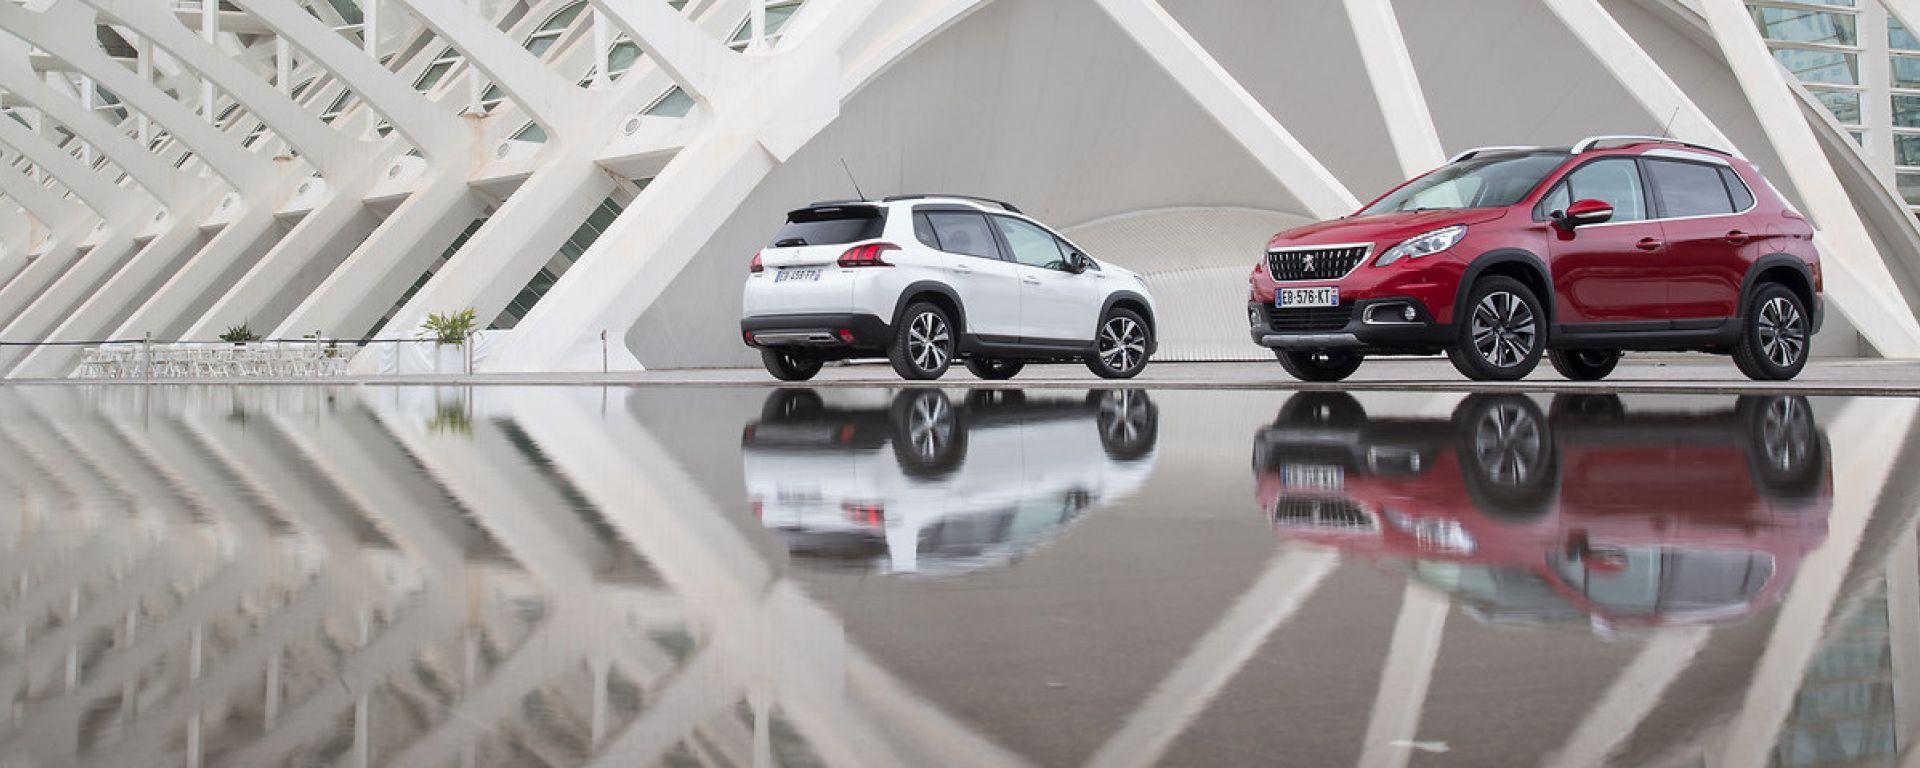 Peugeot 2008: nuovi motori PureTech